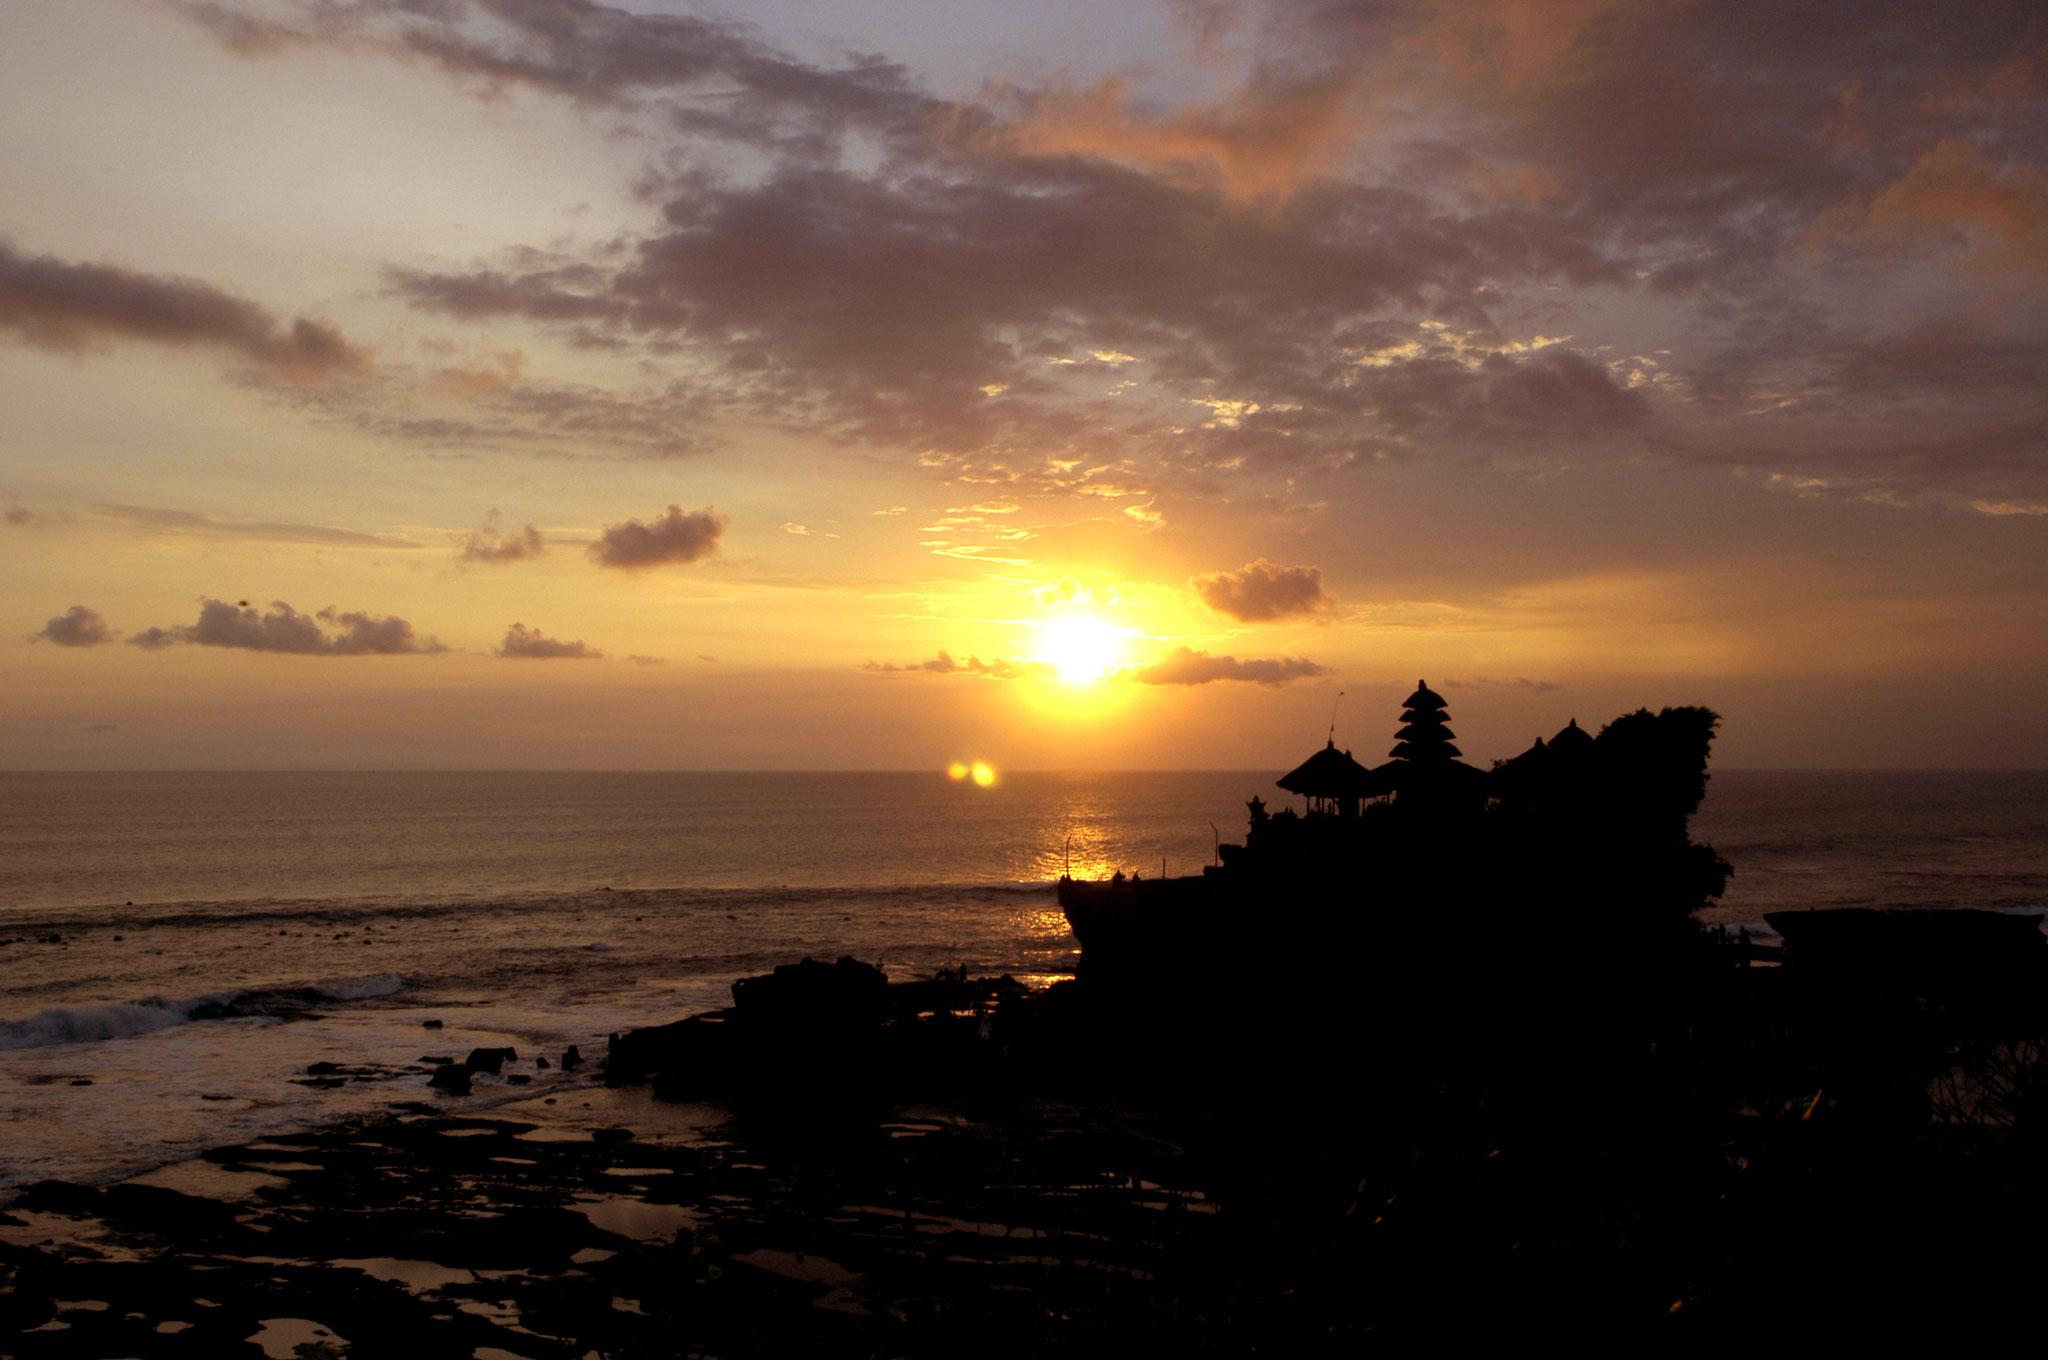 Sonnenuntergang beim Tanah Lot Tempel